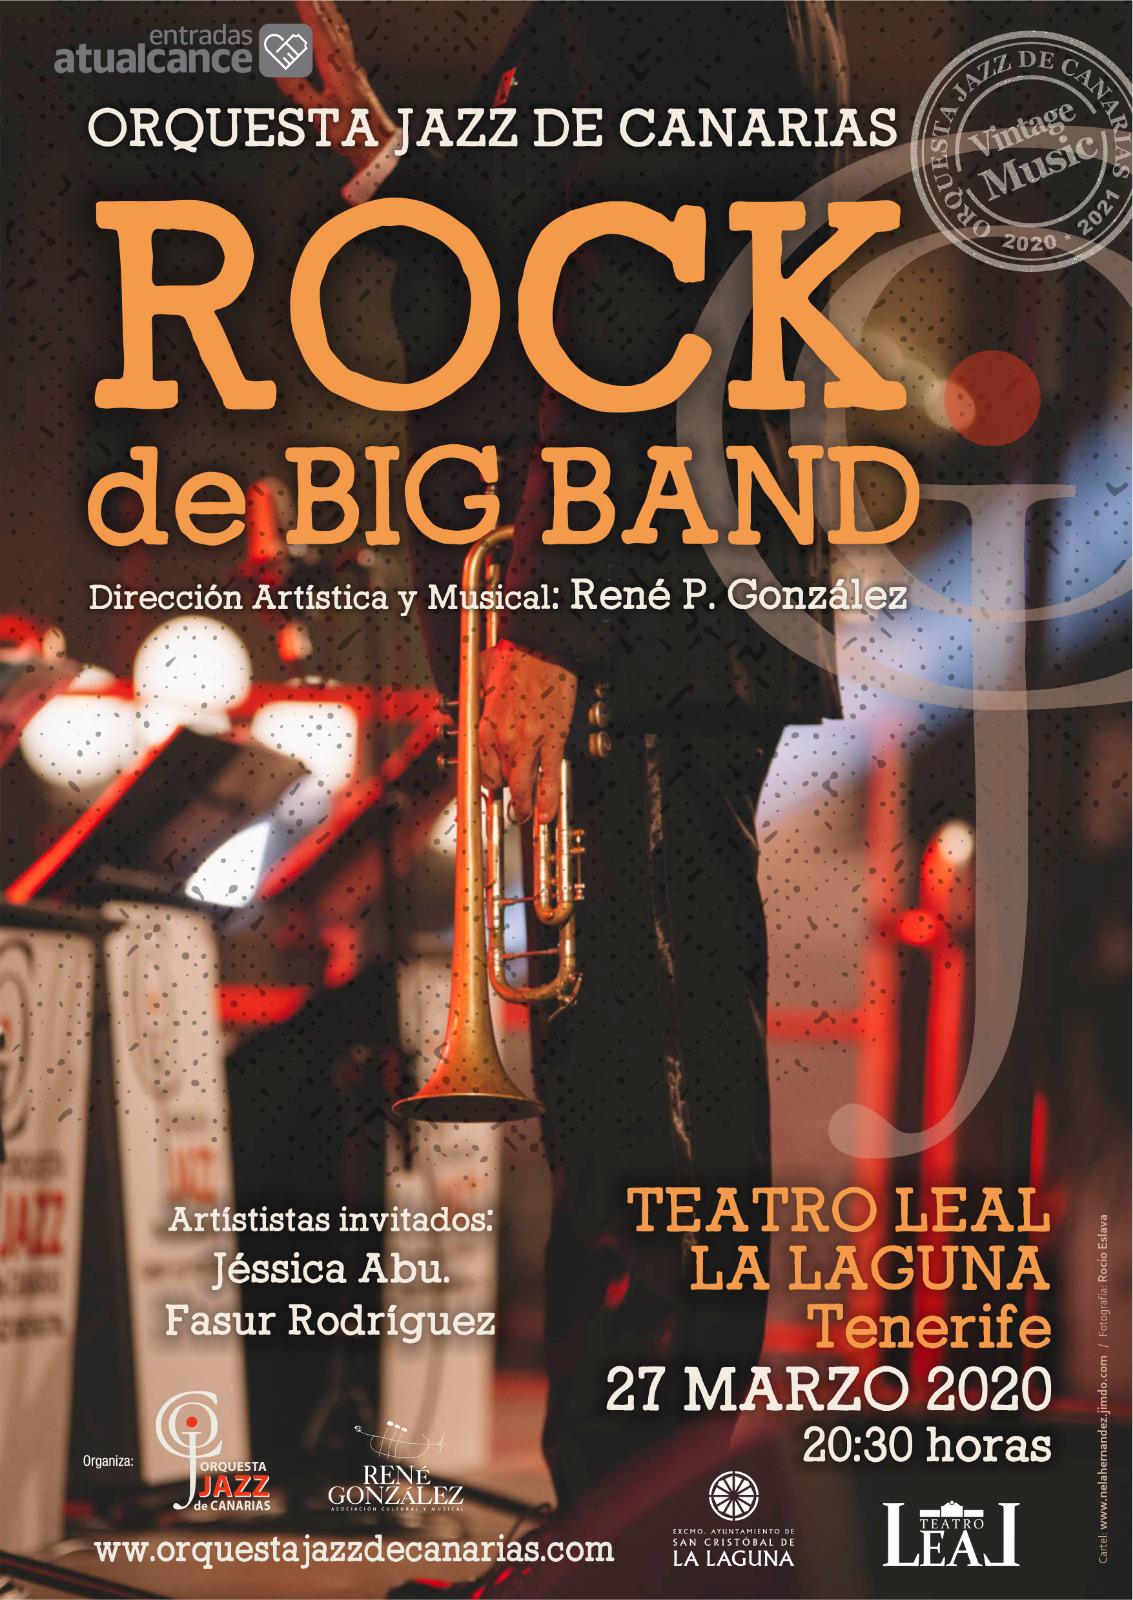 orquesta-de-jazz-de-canarias-rock-de-big-band-5e4d730b3abc3.jpeg